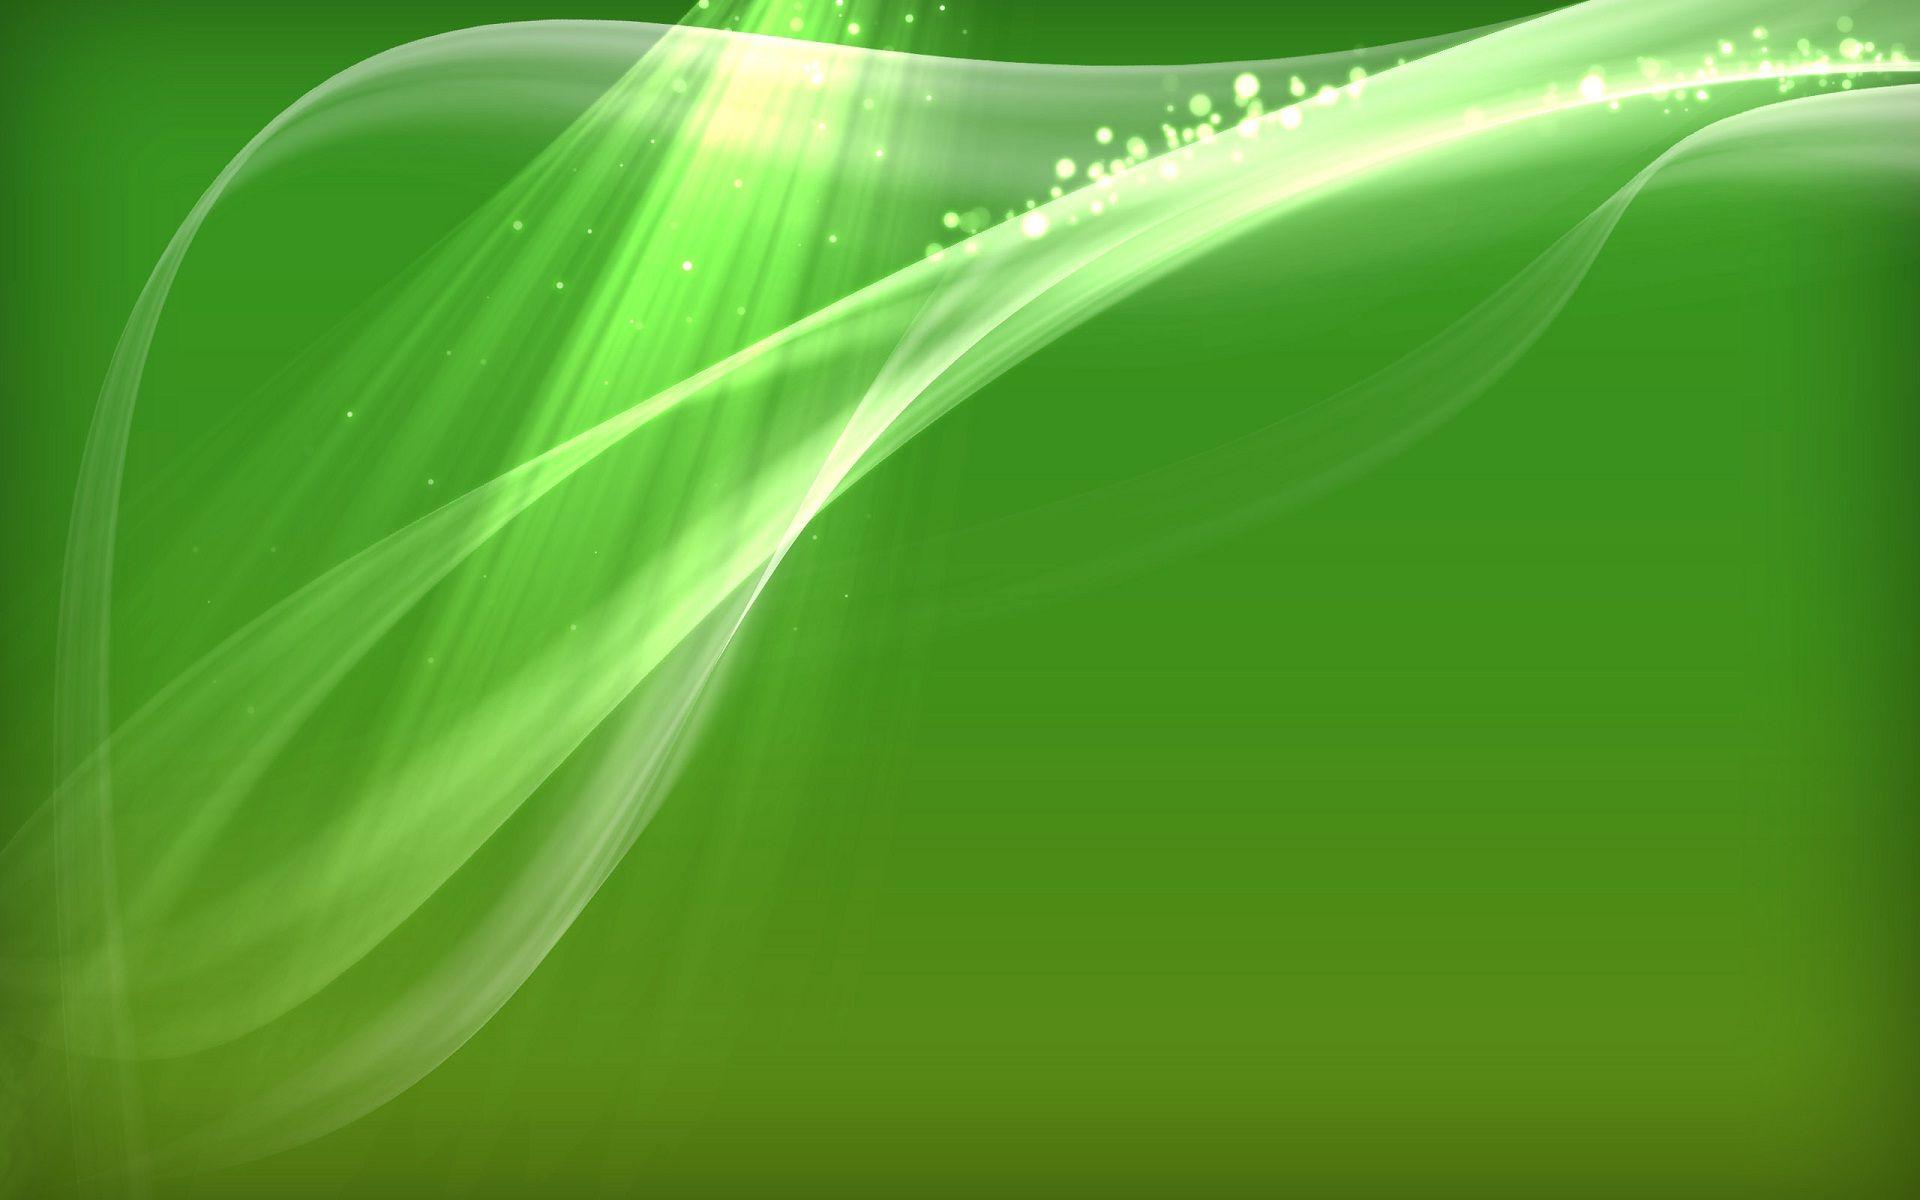 Simple Shnie Green Theme Abstact Desktop Wallpapers